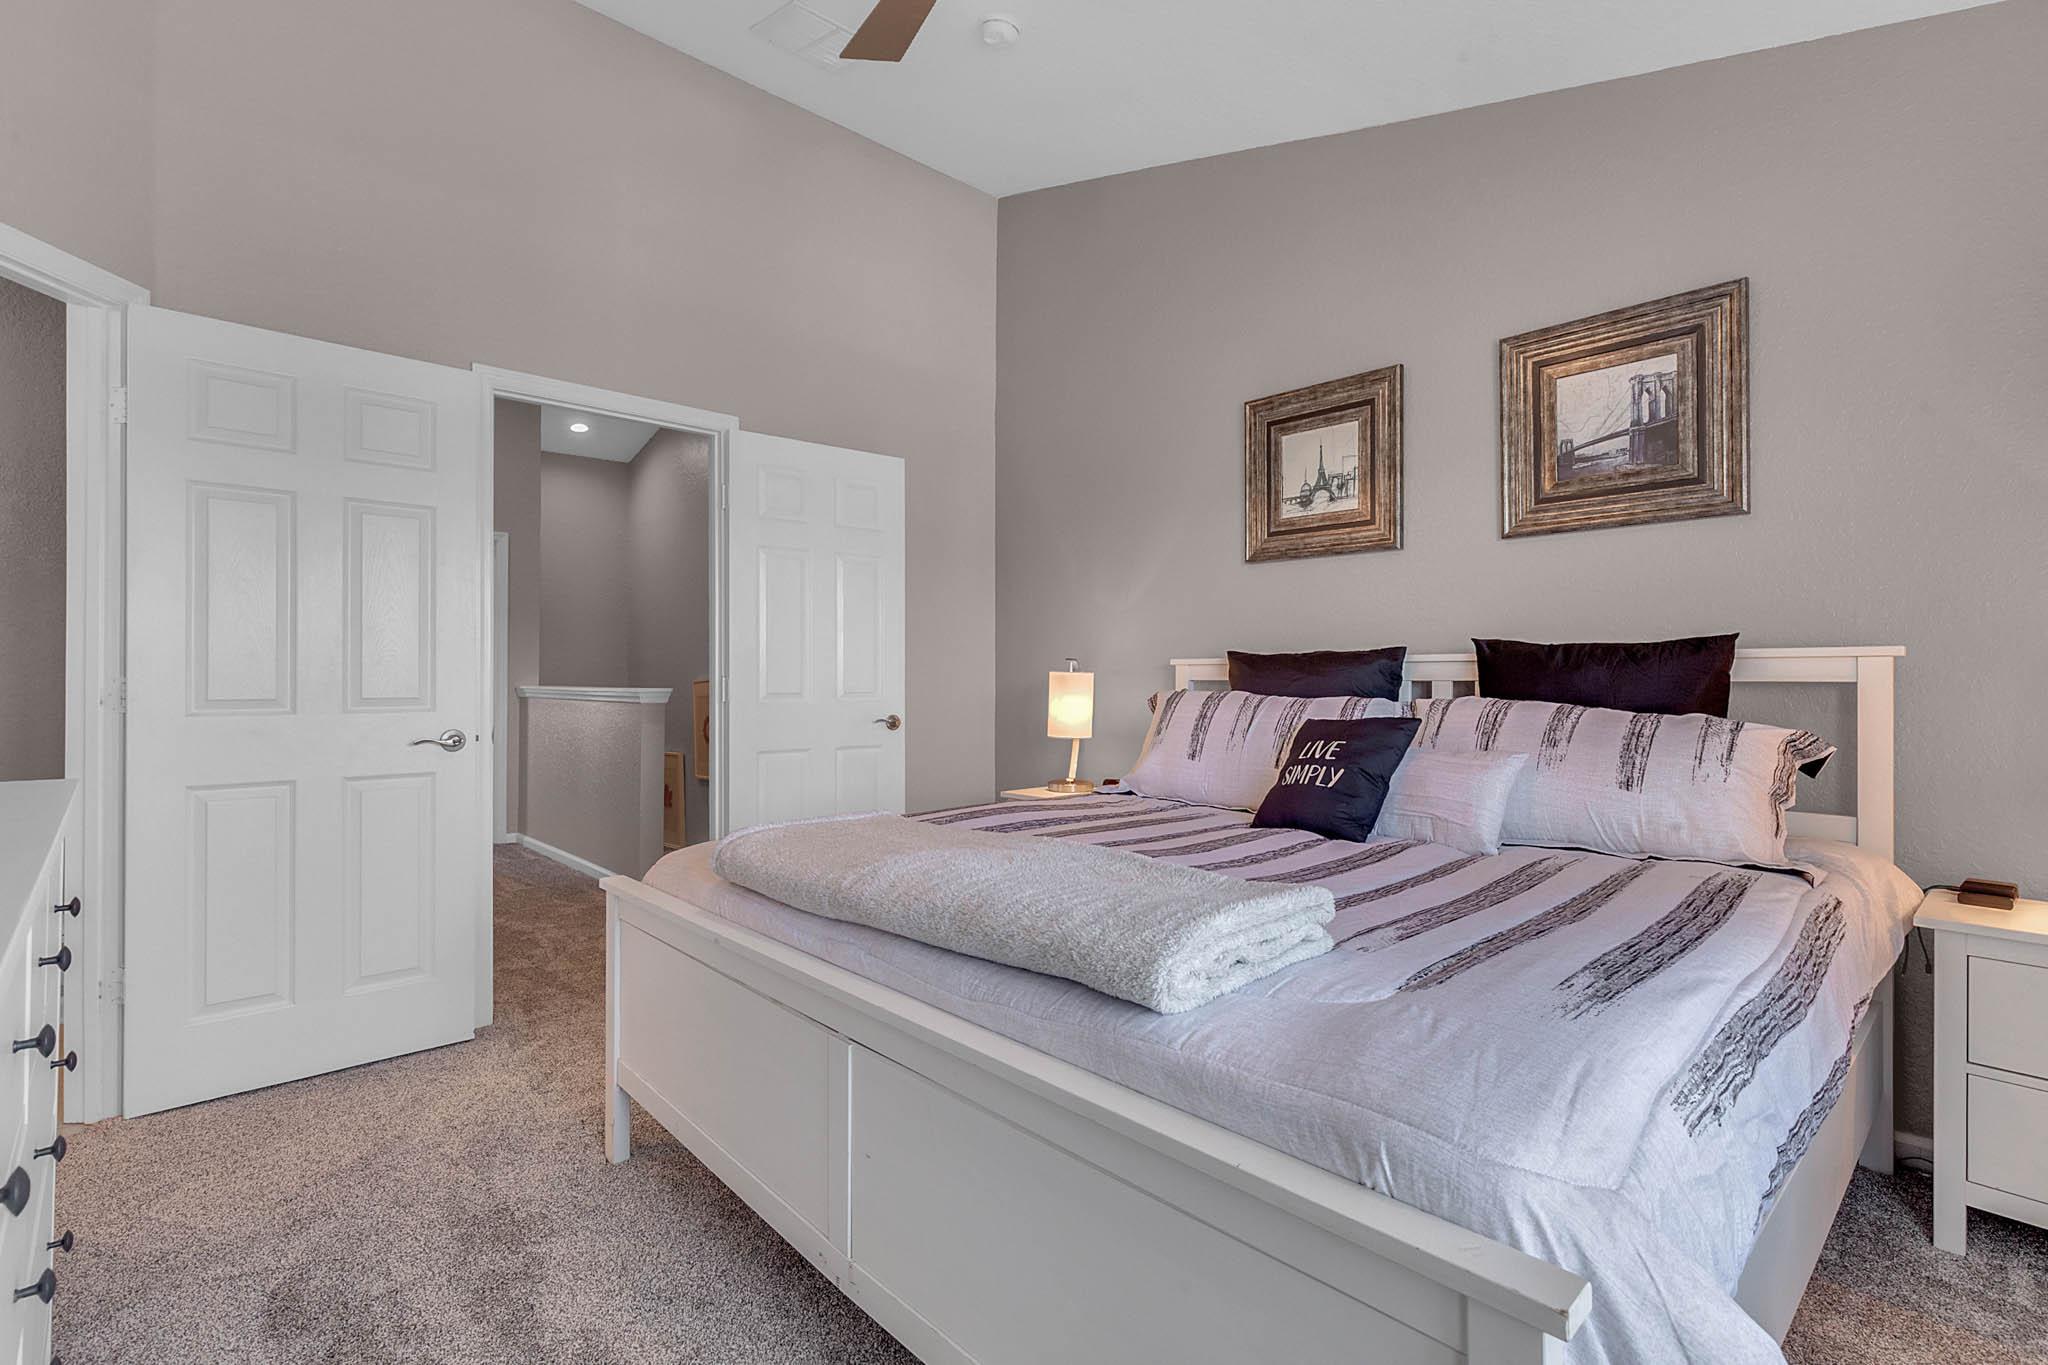 Stylish Furniture & Decor